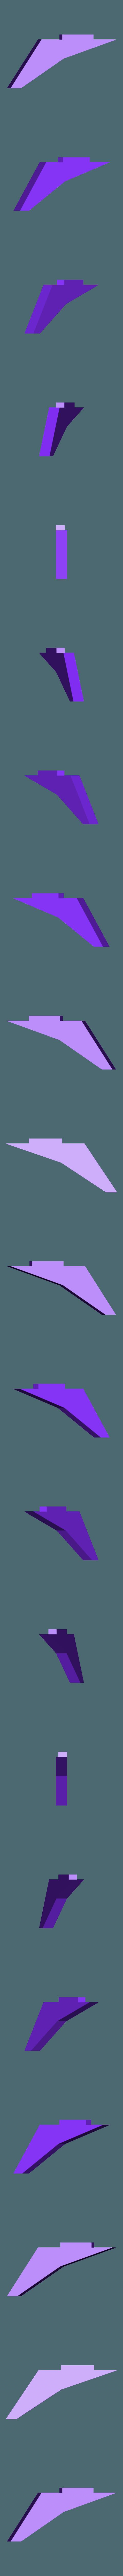 Part-Teil 06 Foot - Fuss.stl Download free STL file BBQ Fan Extension for Gearbox 256 / Grillgebläse Erweiterung für Getriebe 256 • 3D print design, CONSTRUCTeR